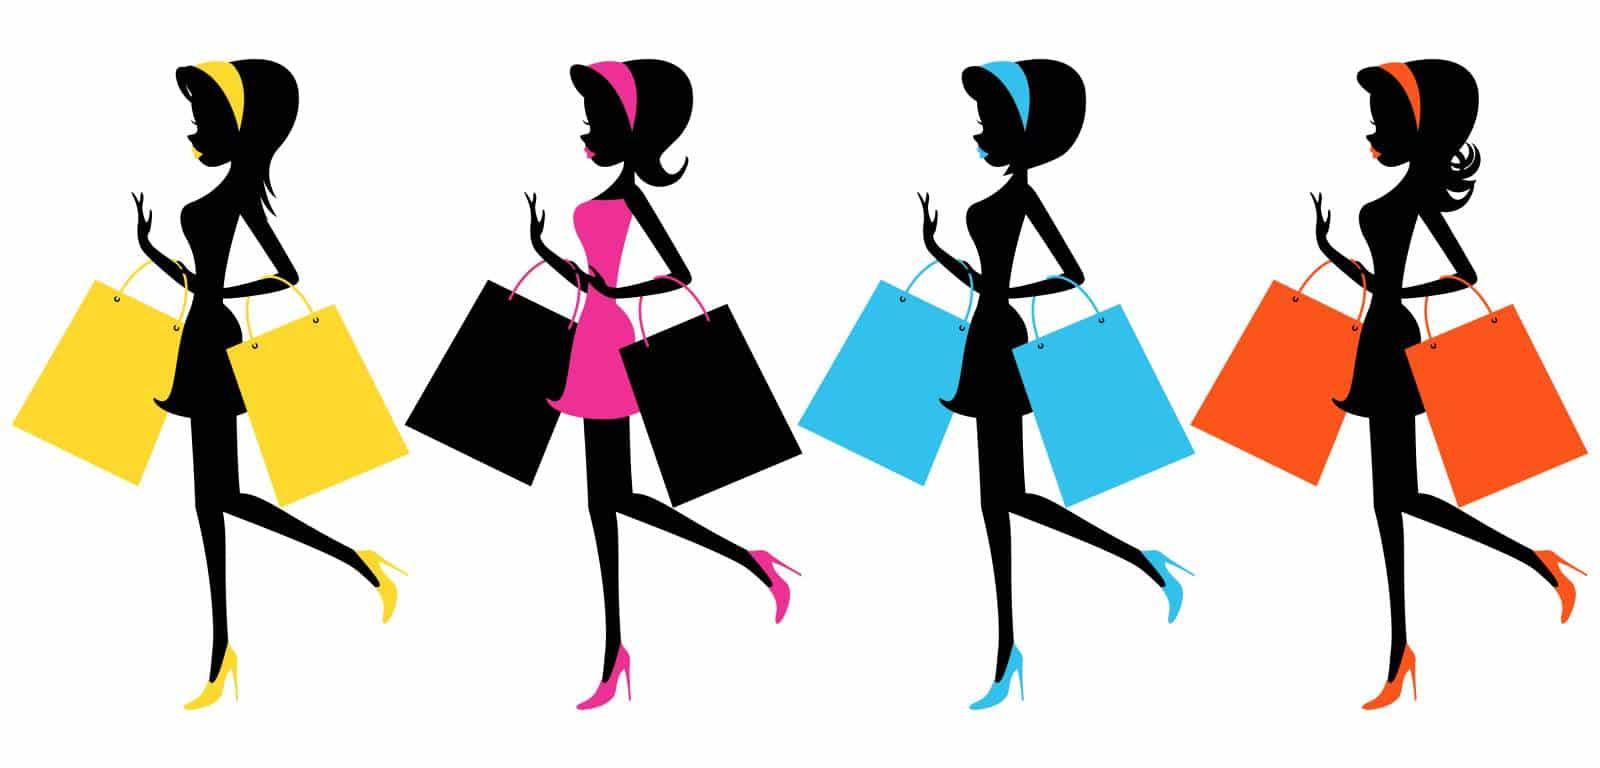 comprare con gusto il trend delle shopping bag italyan. Black Bedroom Furniture Sets. Home Design Ideas